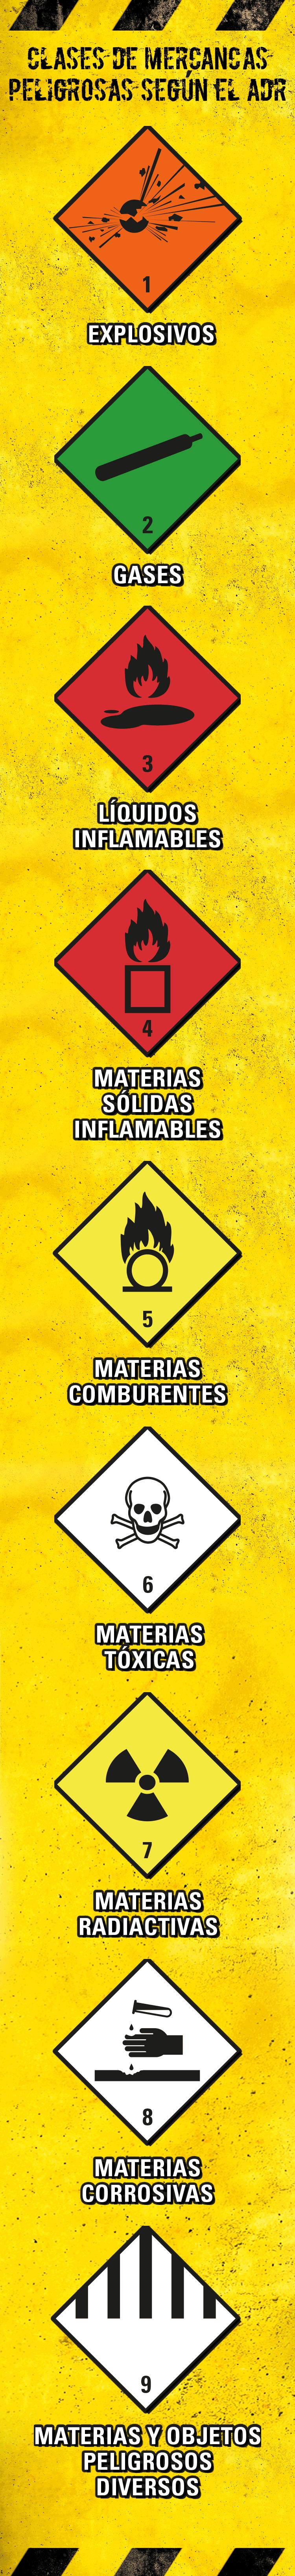 Better-Safe_content_images_Hazards_ES